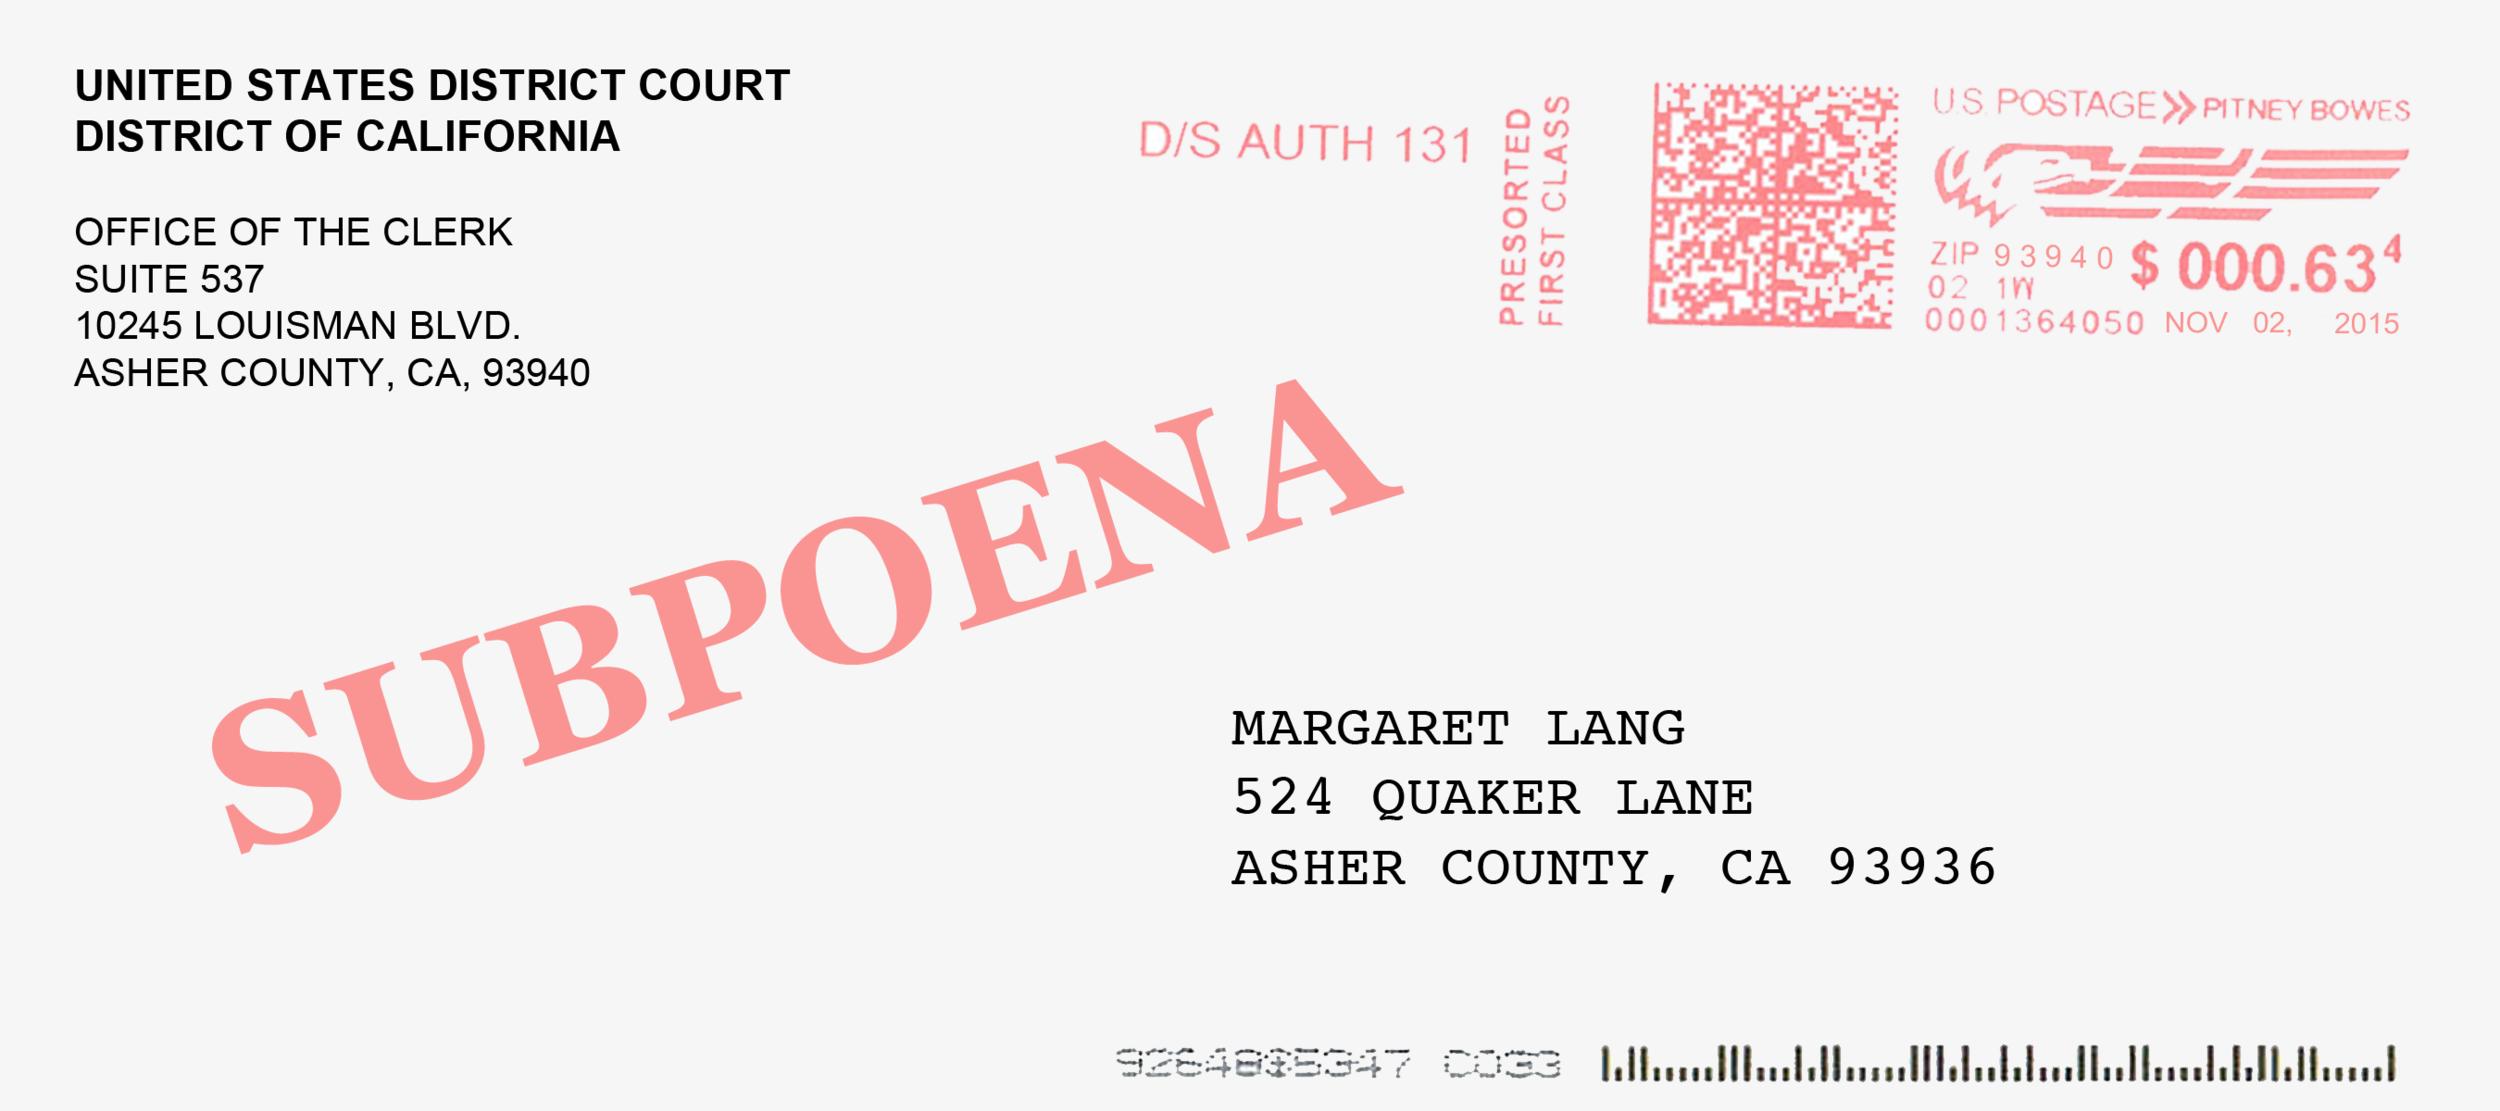 subpoena 1.png